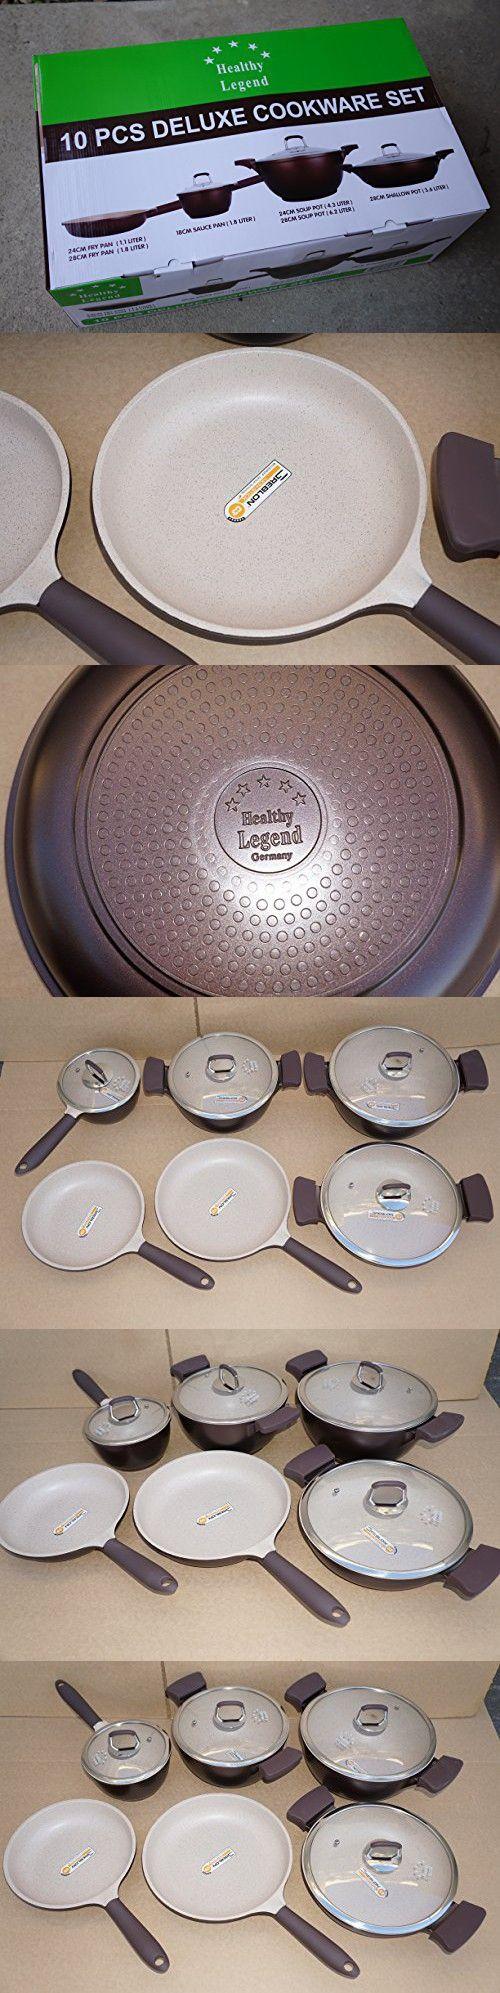 Third Generation Healthy Legend 10 pcs Set Non-stick German Weilburger Ceramic Coating Cookware Set - Eco Friendly, Non-toxic